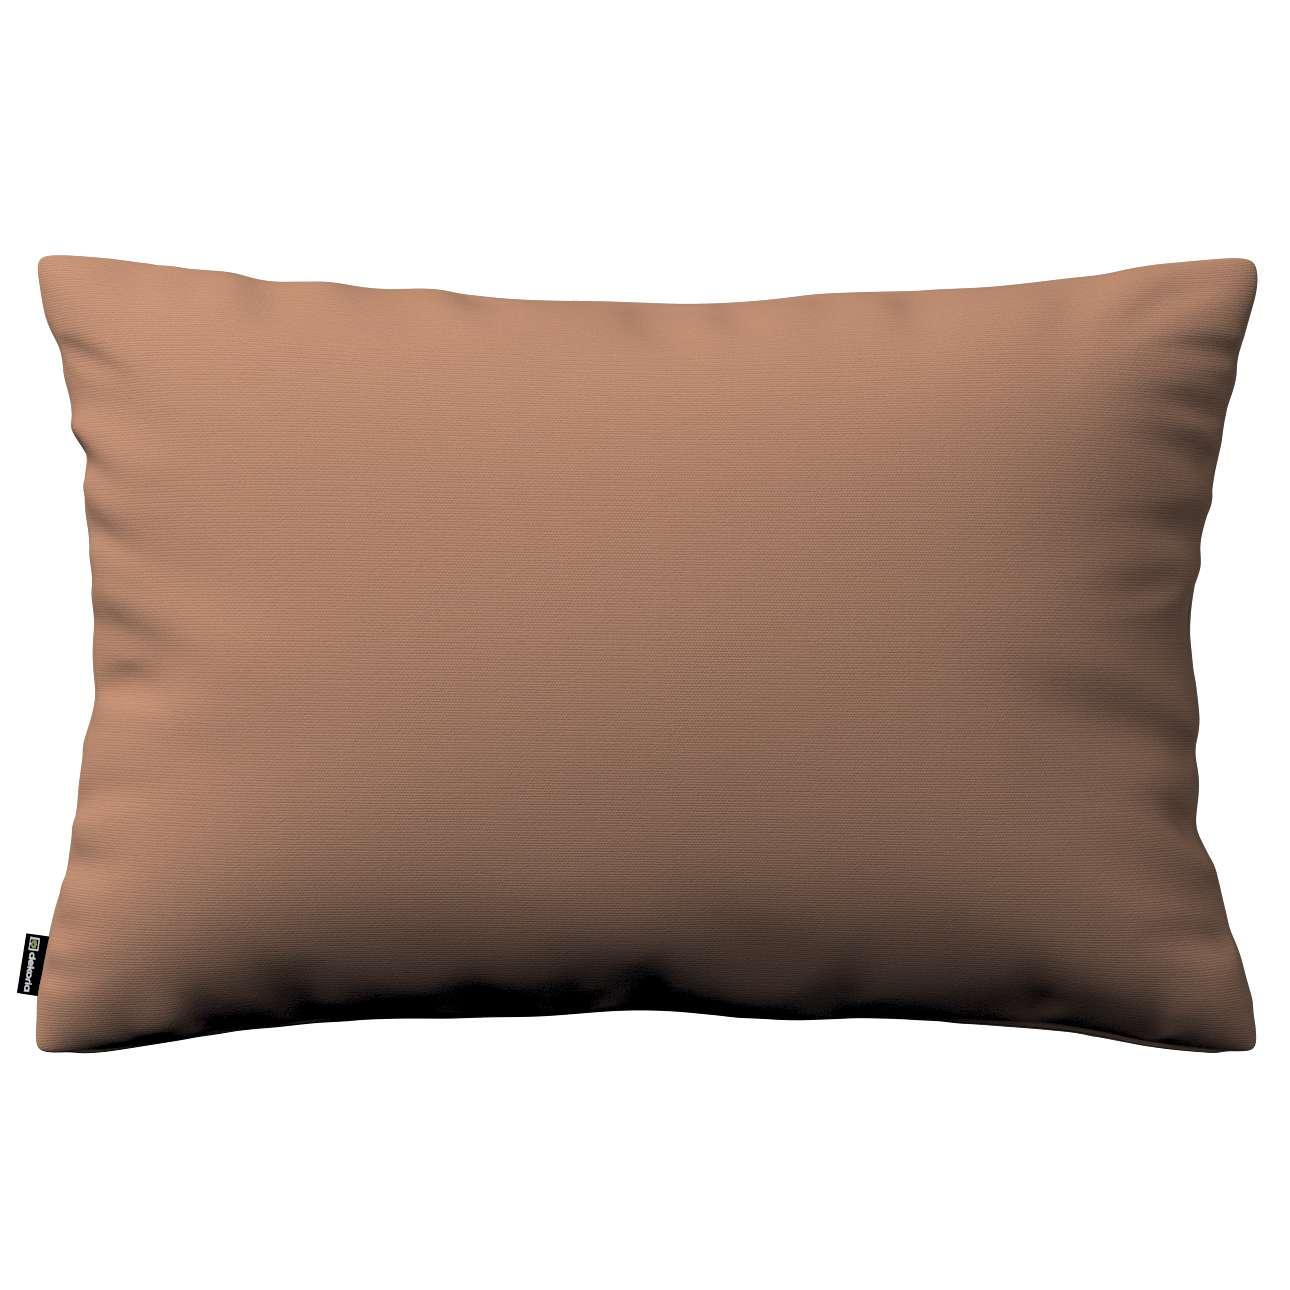 Kissenhülle Kinga 60x40cm 60x40cm von der Kollektion Cotton Panama, Stoff: 702-02